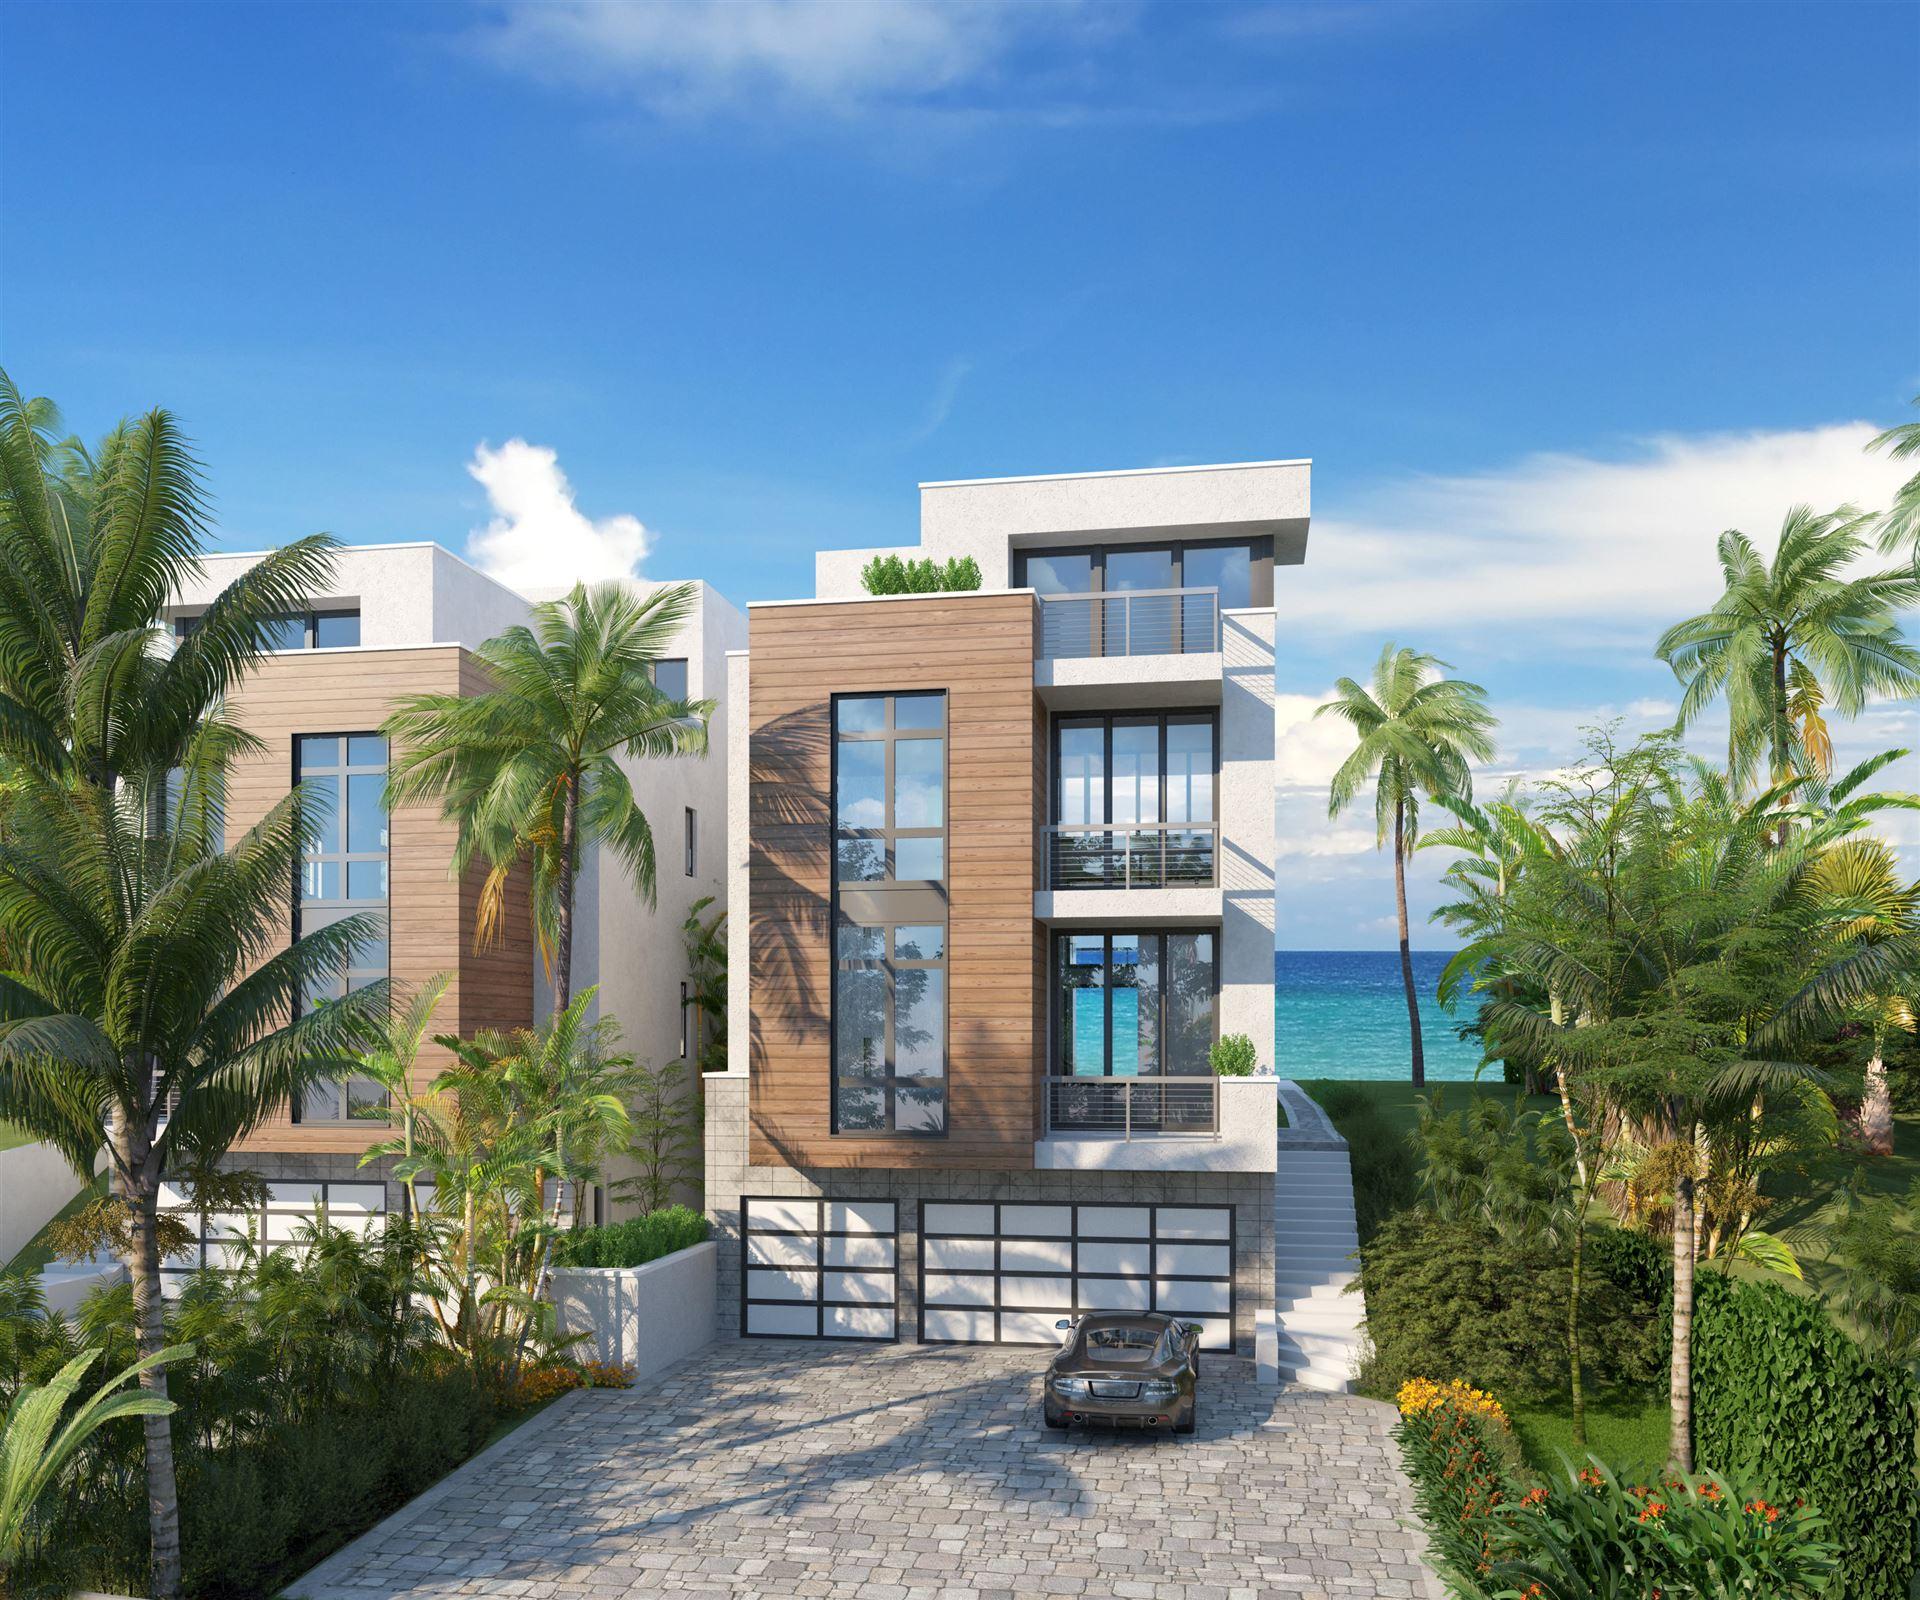 Photo of 4513 S Ocean Boulevard, Highland Beach, FL 33487 (MLS # RX-10633757)